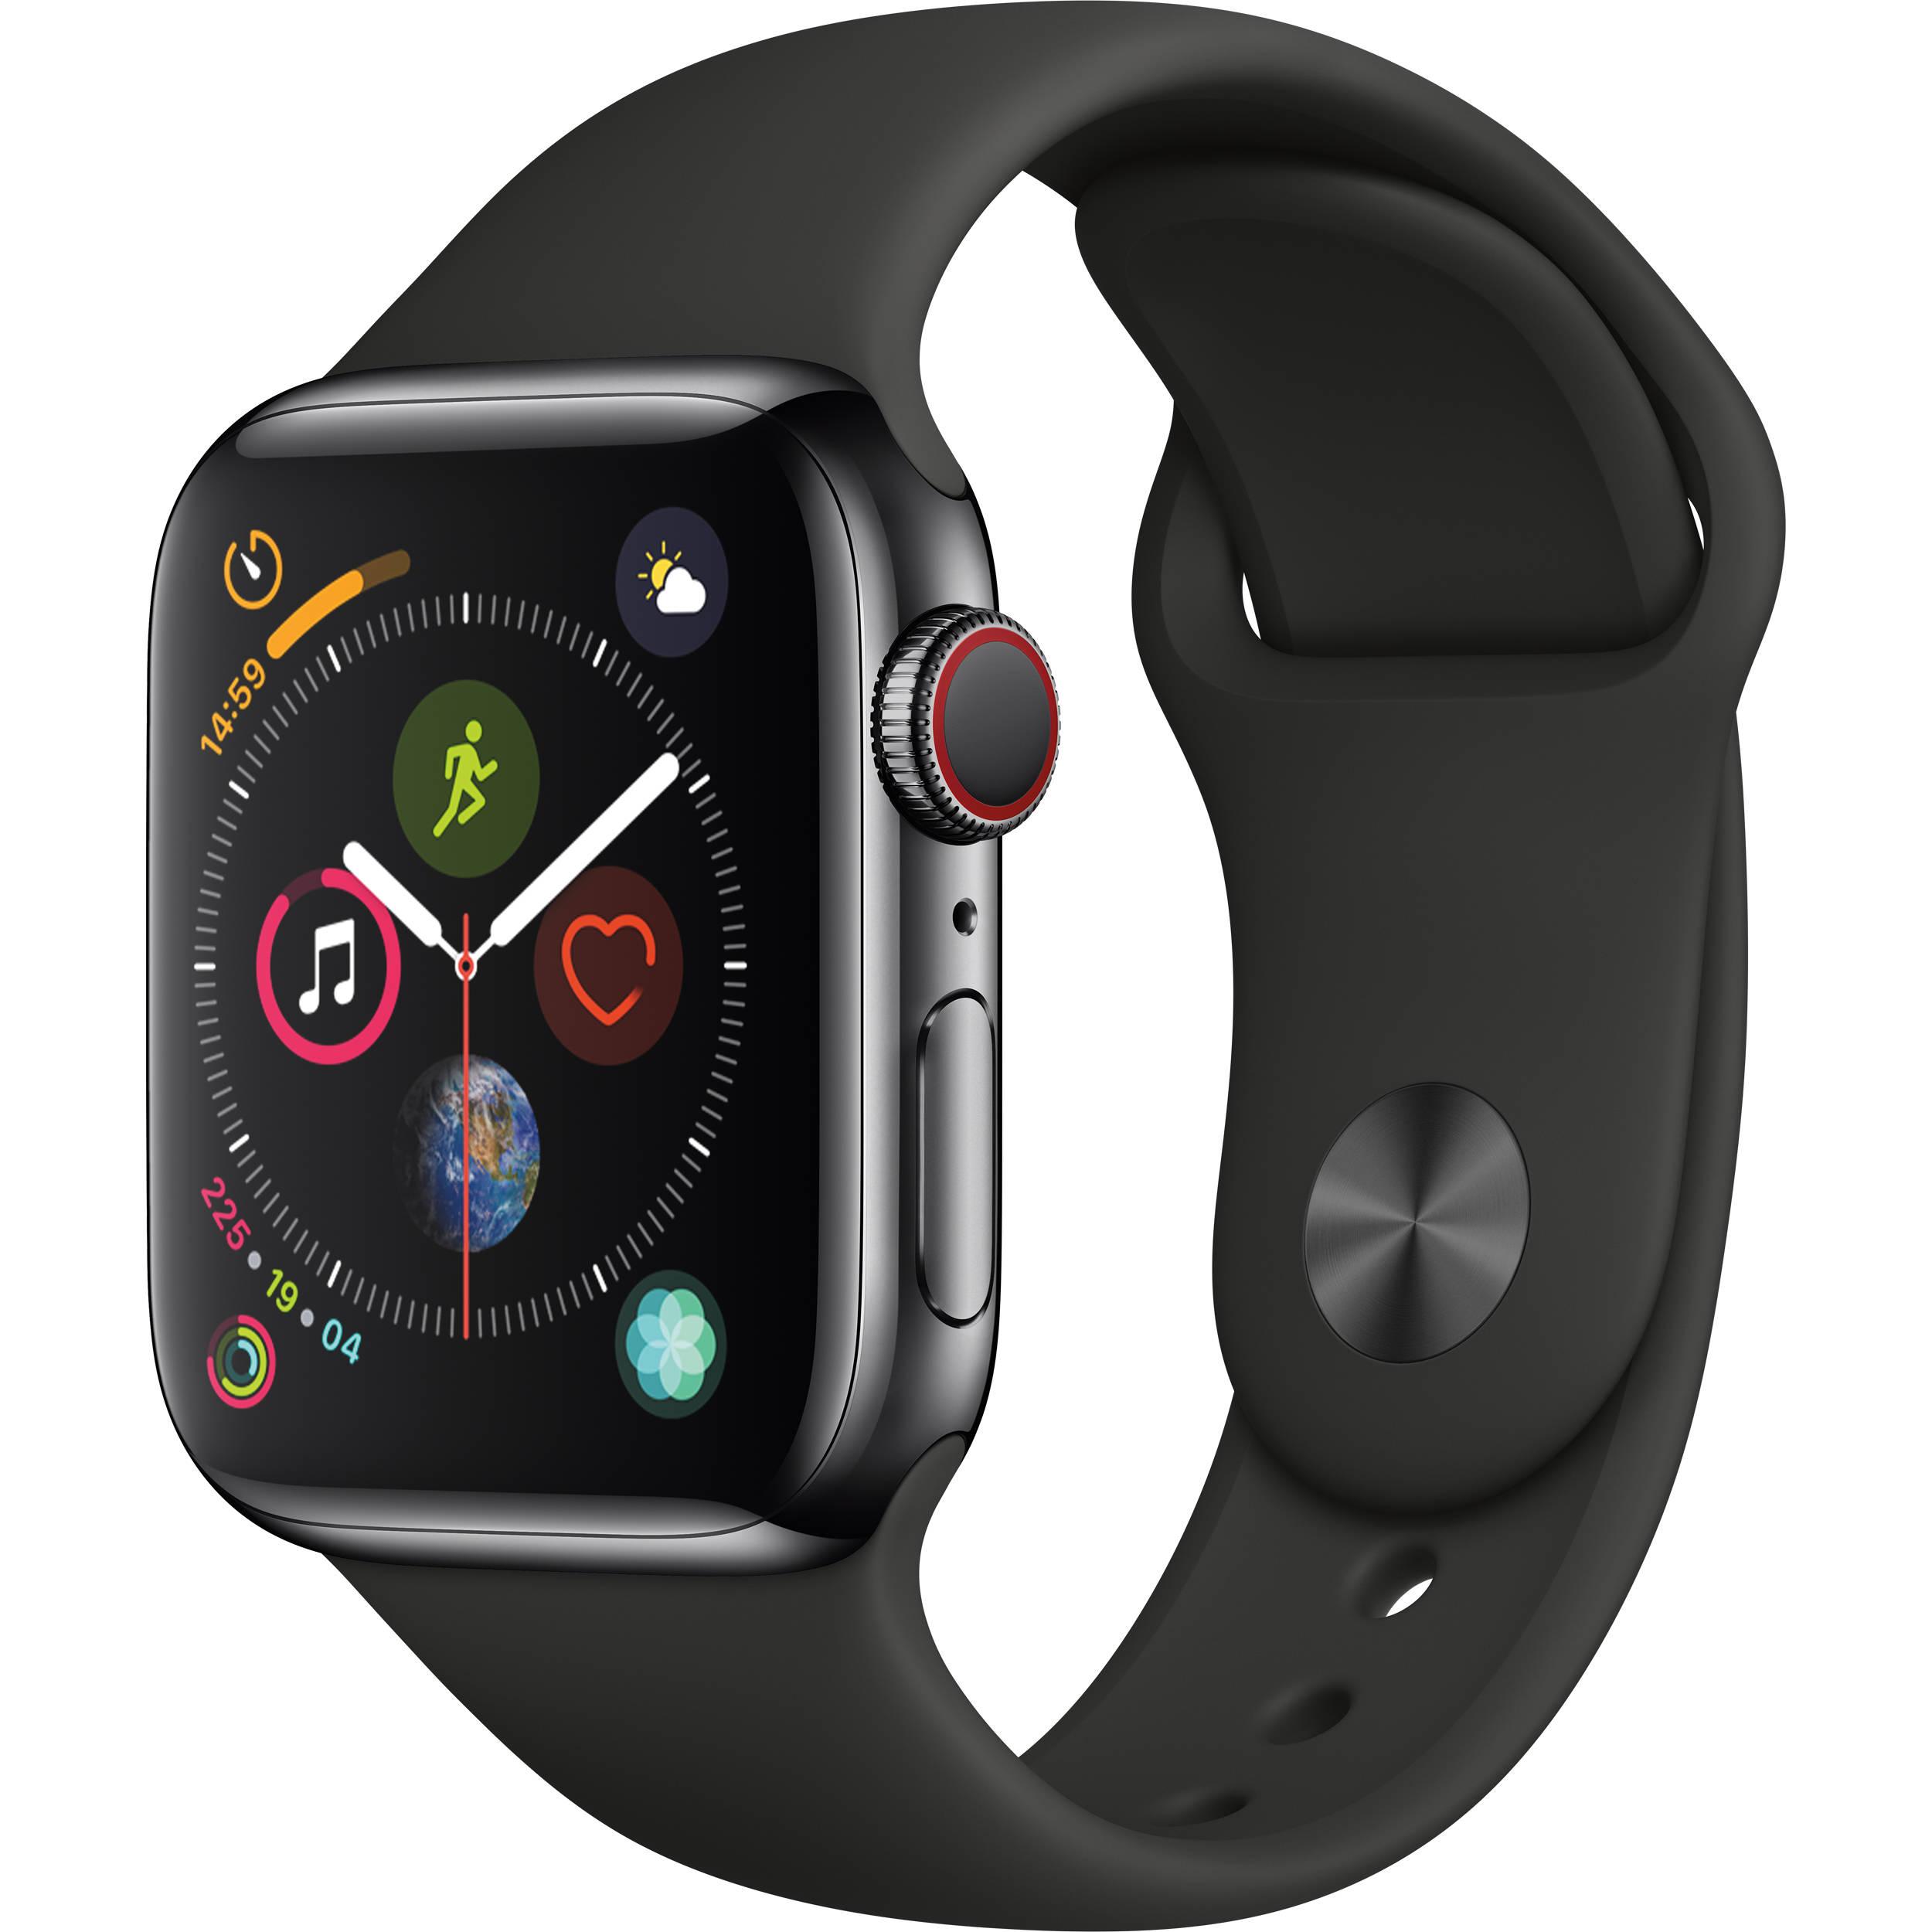 best website b50c2 13fac Apple Watch Series 4 (GPS + Cellular, 40mm, Space Black Stainless Steel,  Black Sport Band)